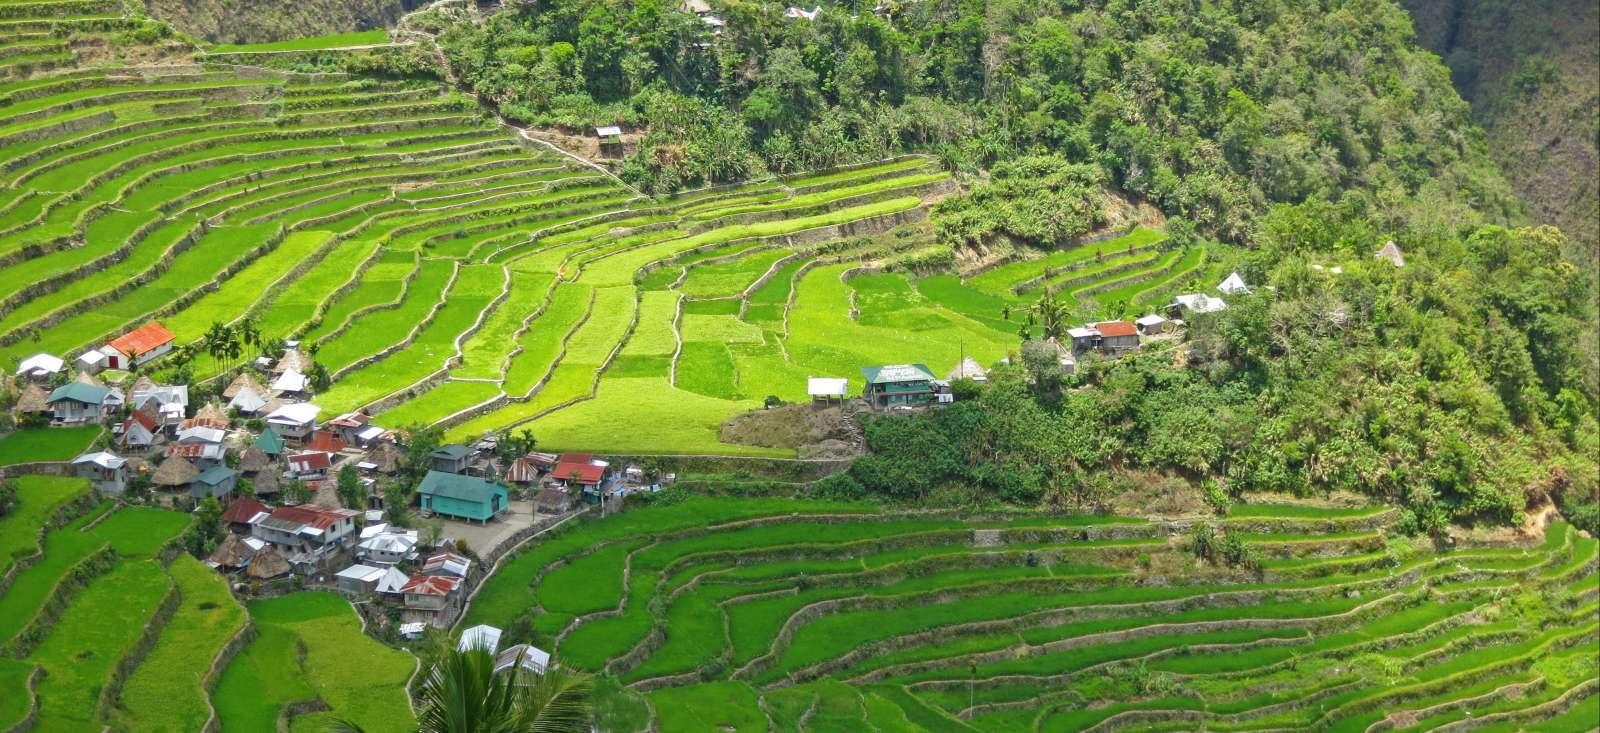 Voyage à pied : Tribus Ifugao & Archipel de Busuanga